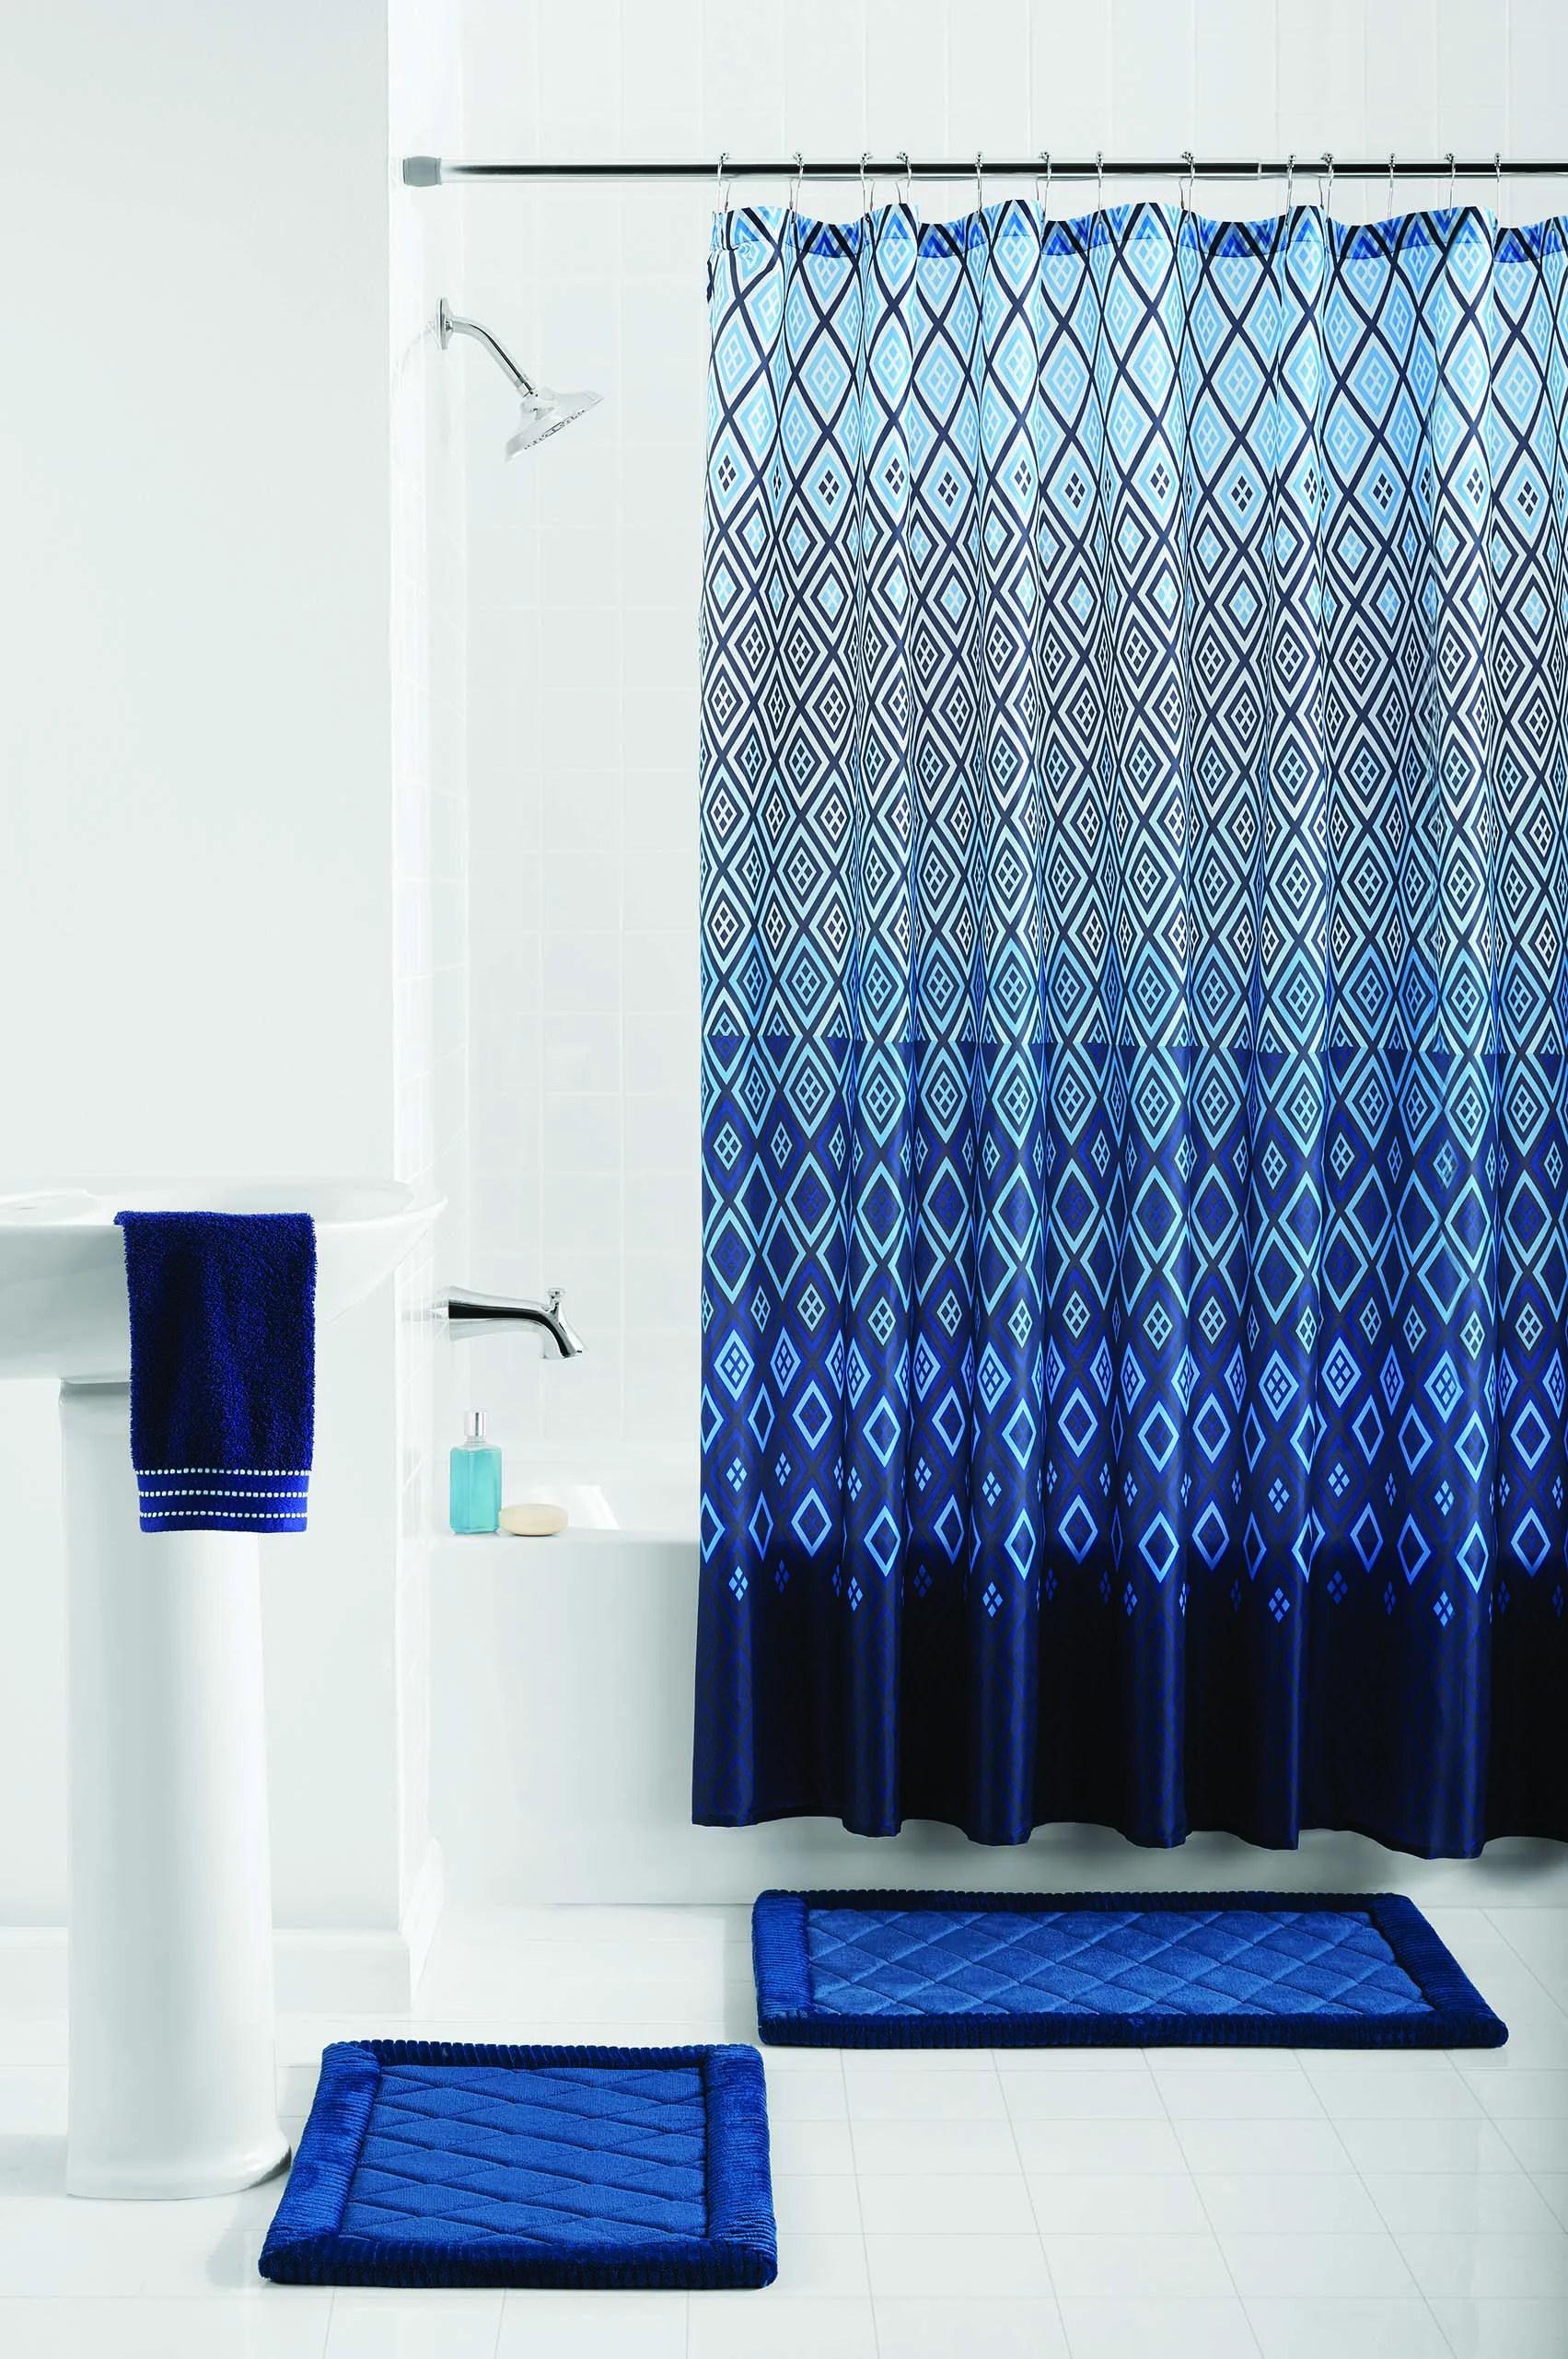 mainstays stockholm geometric 15 piece shower curtain bath set